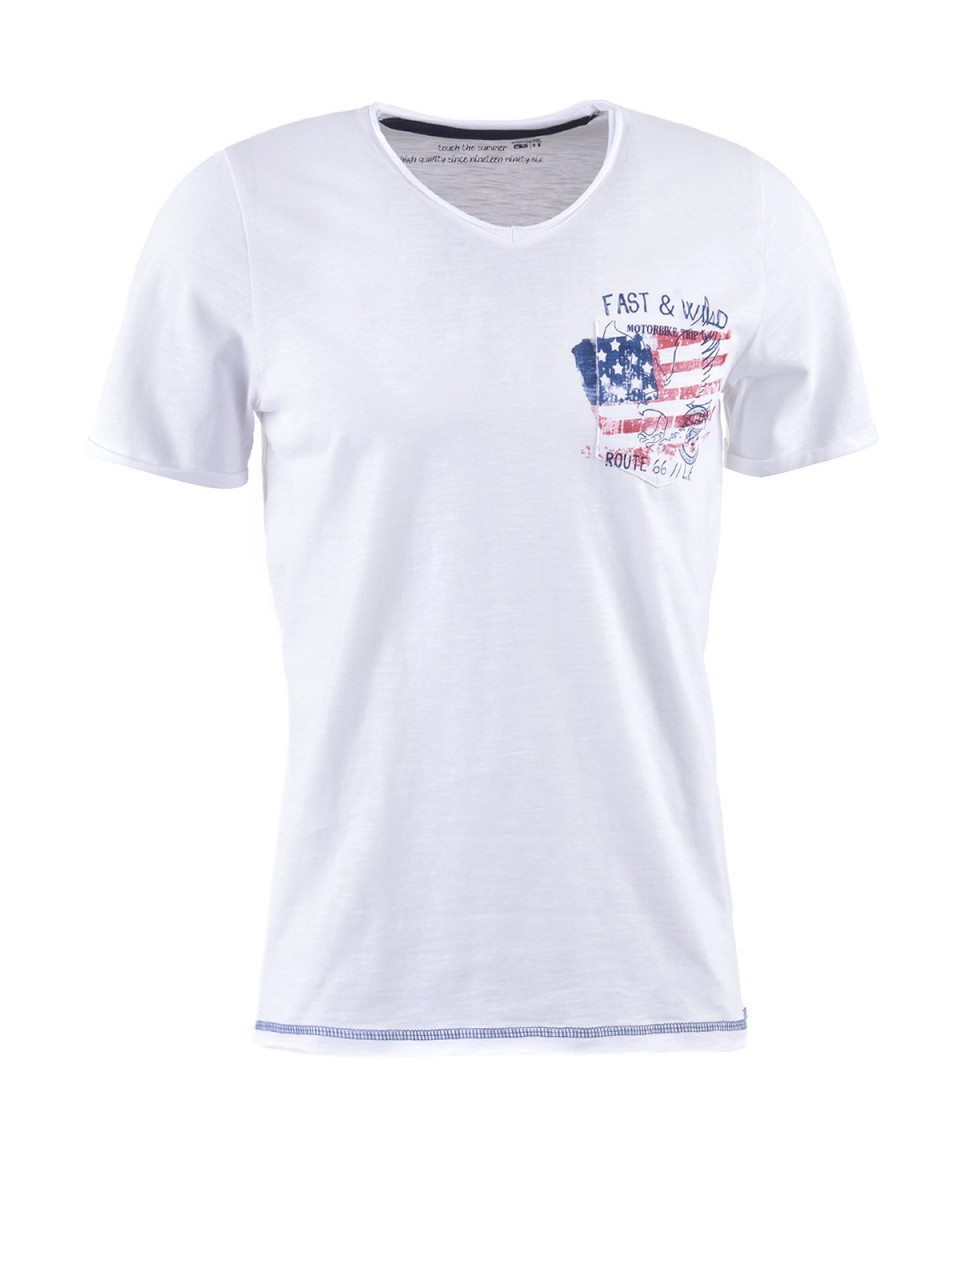 milano-italy-herren-t-shirt-wei-szlig-